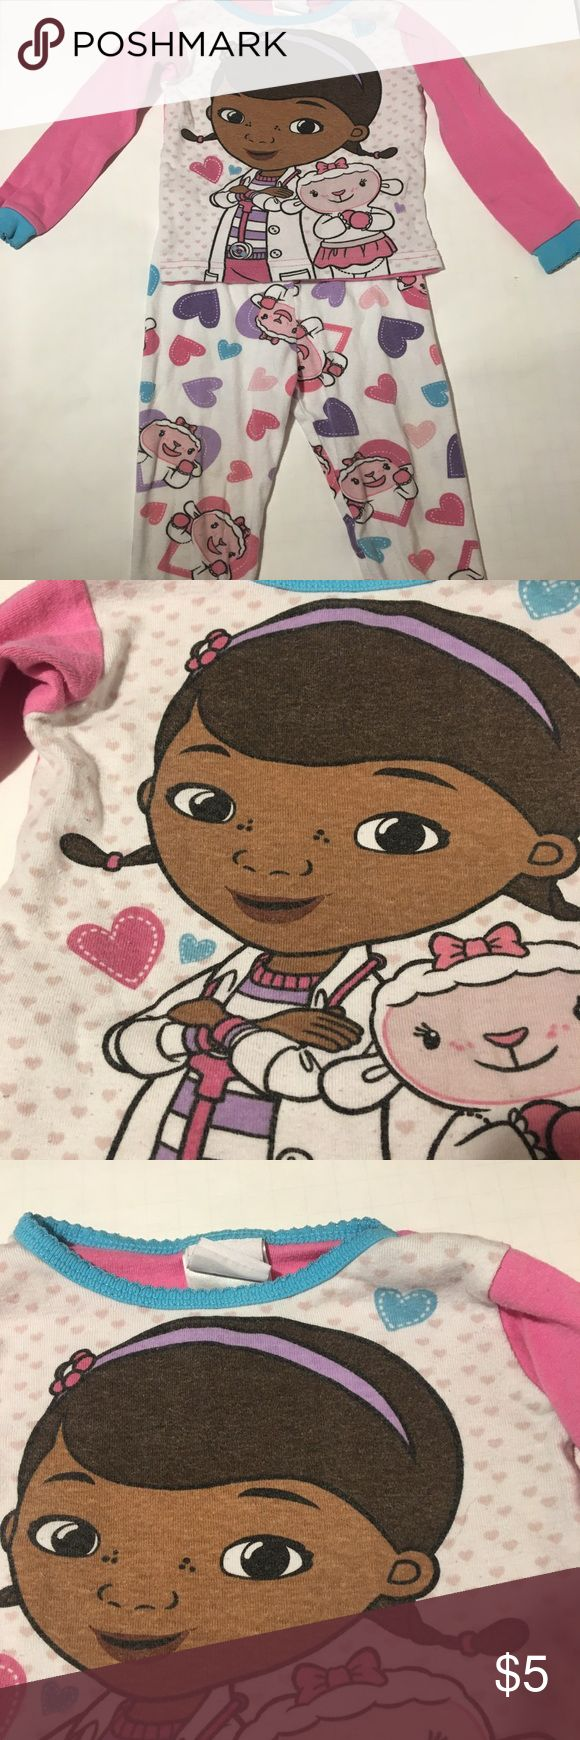 Doc McStuffins size 2T pajamas Cute Doc McStuffins pajamas in size 2T. Pants & long sleeve shirt. Disney Pajamas Pajama Sets